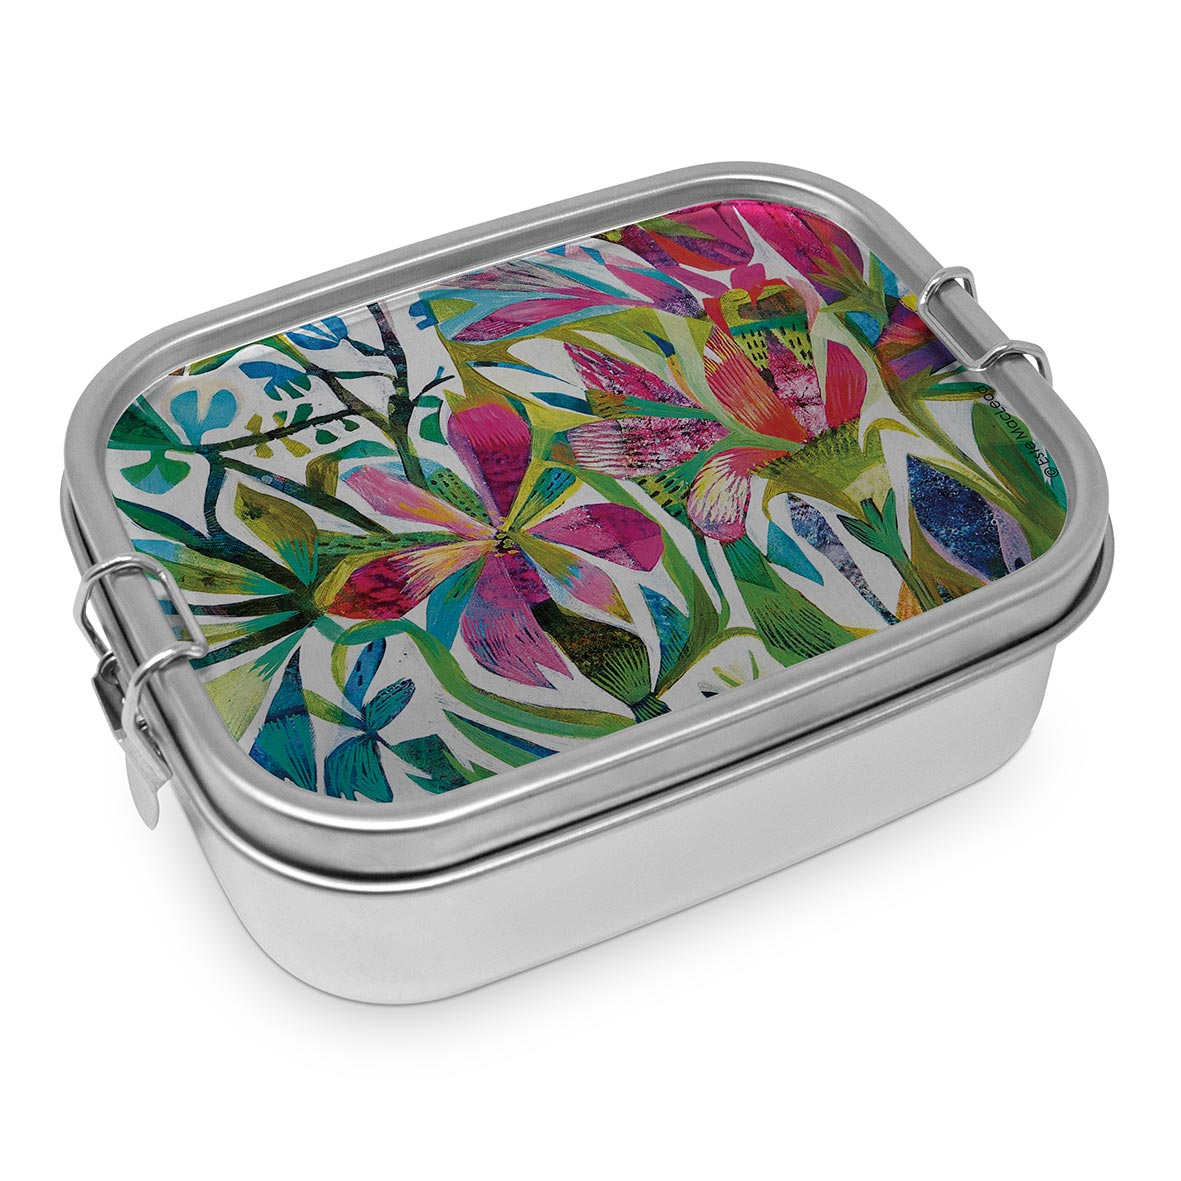 Cuzco Steel Lunch Box